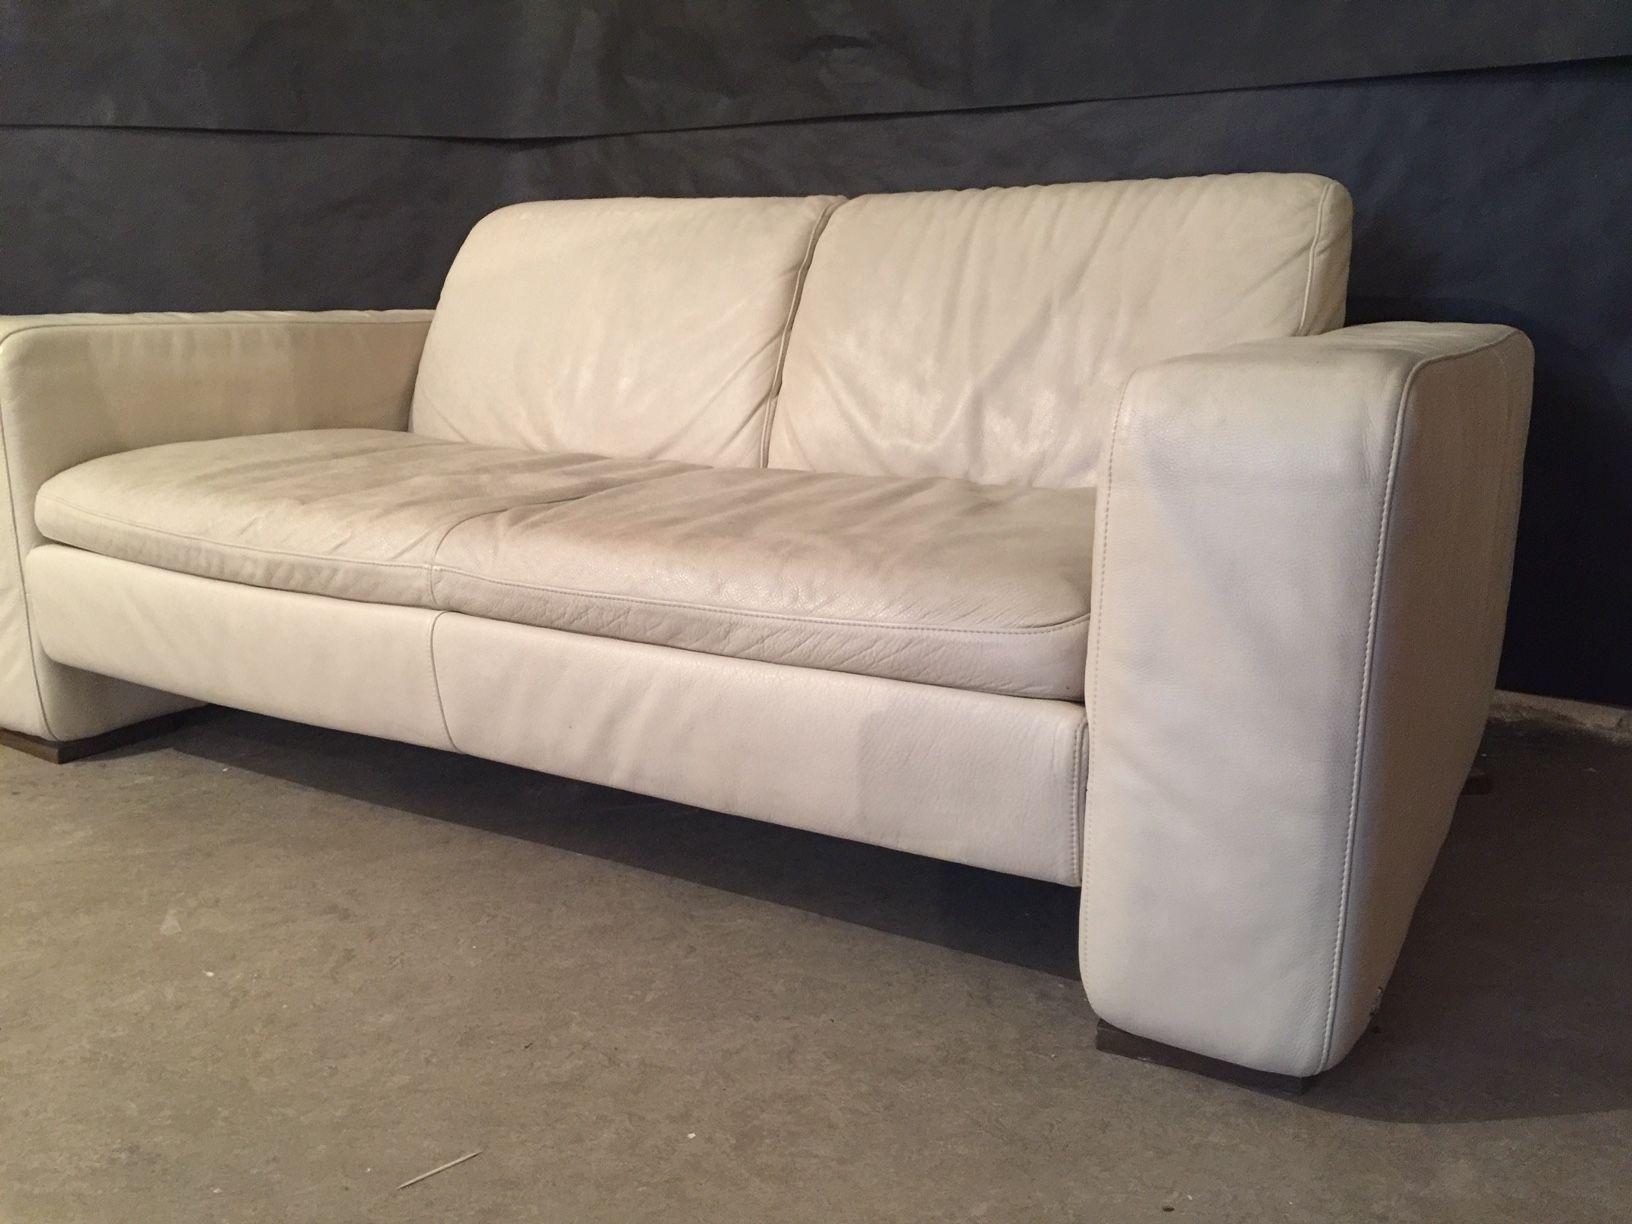 Vintage White Cream Sofa By Natuzzi Italy Design Market